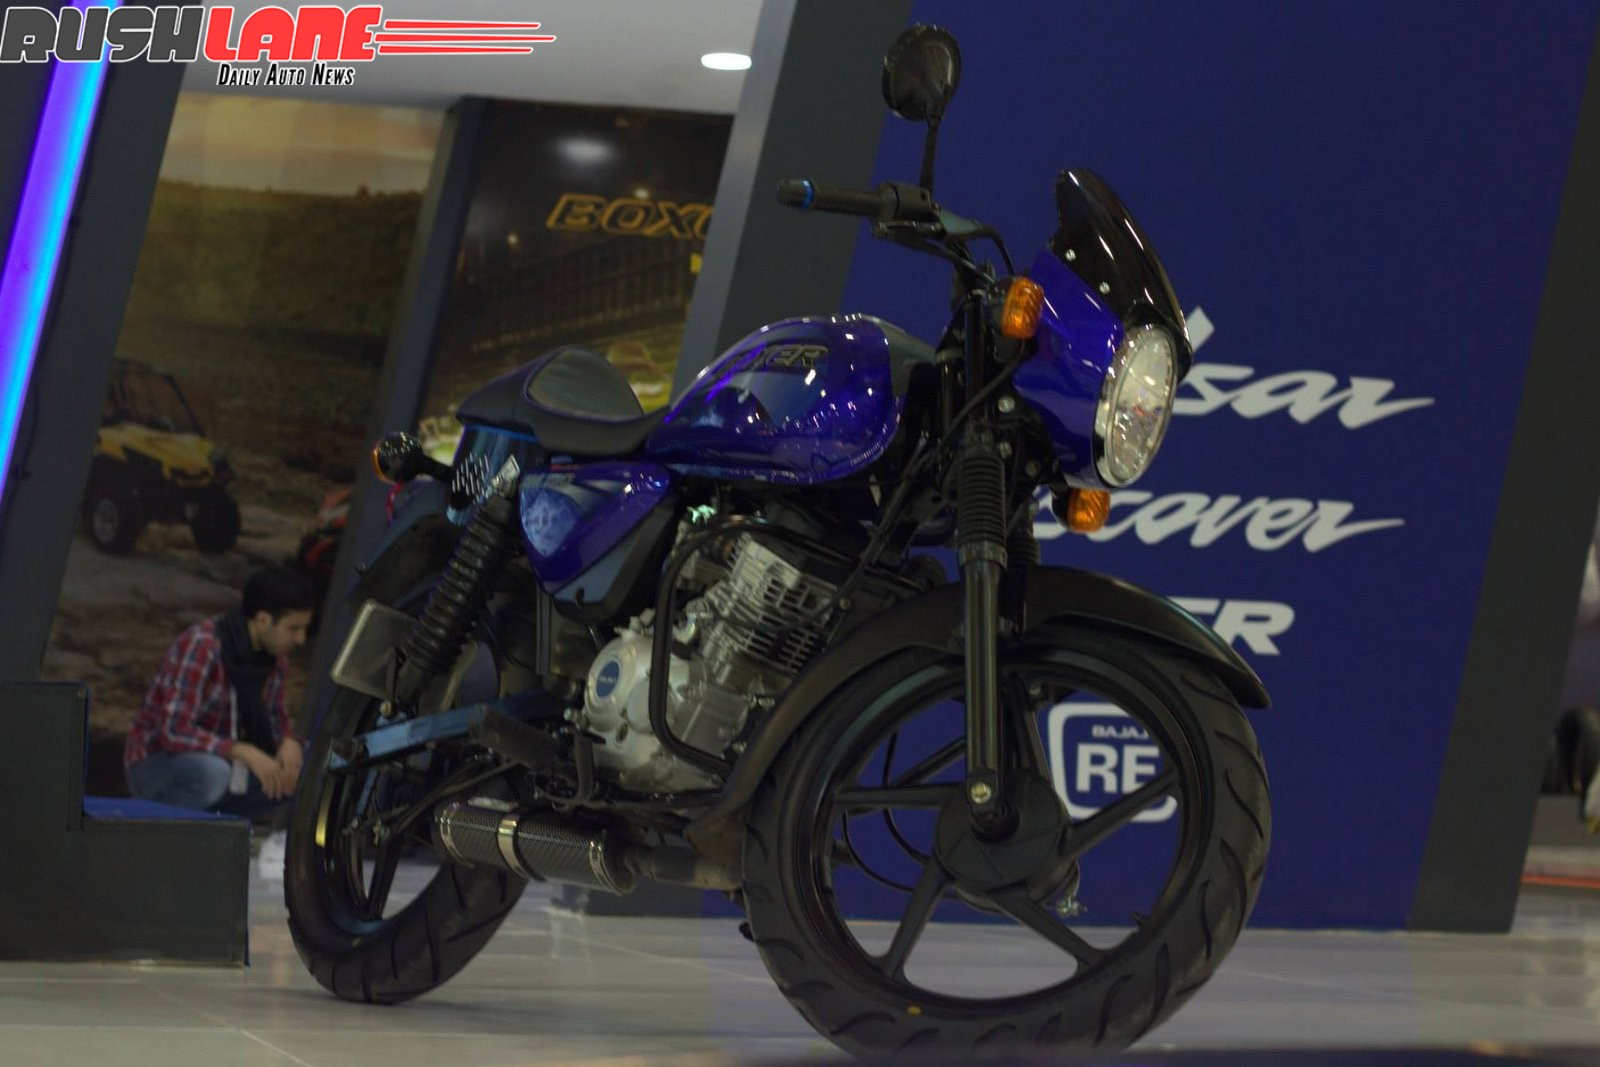 Bajaj Boxer 150 Cafe Racer Unveiled Motoroids